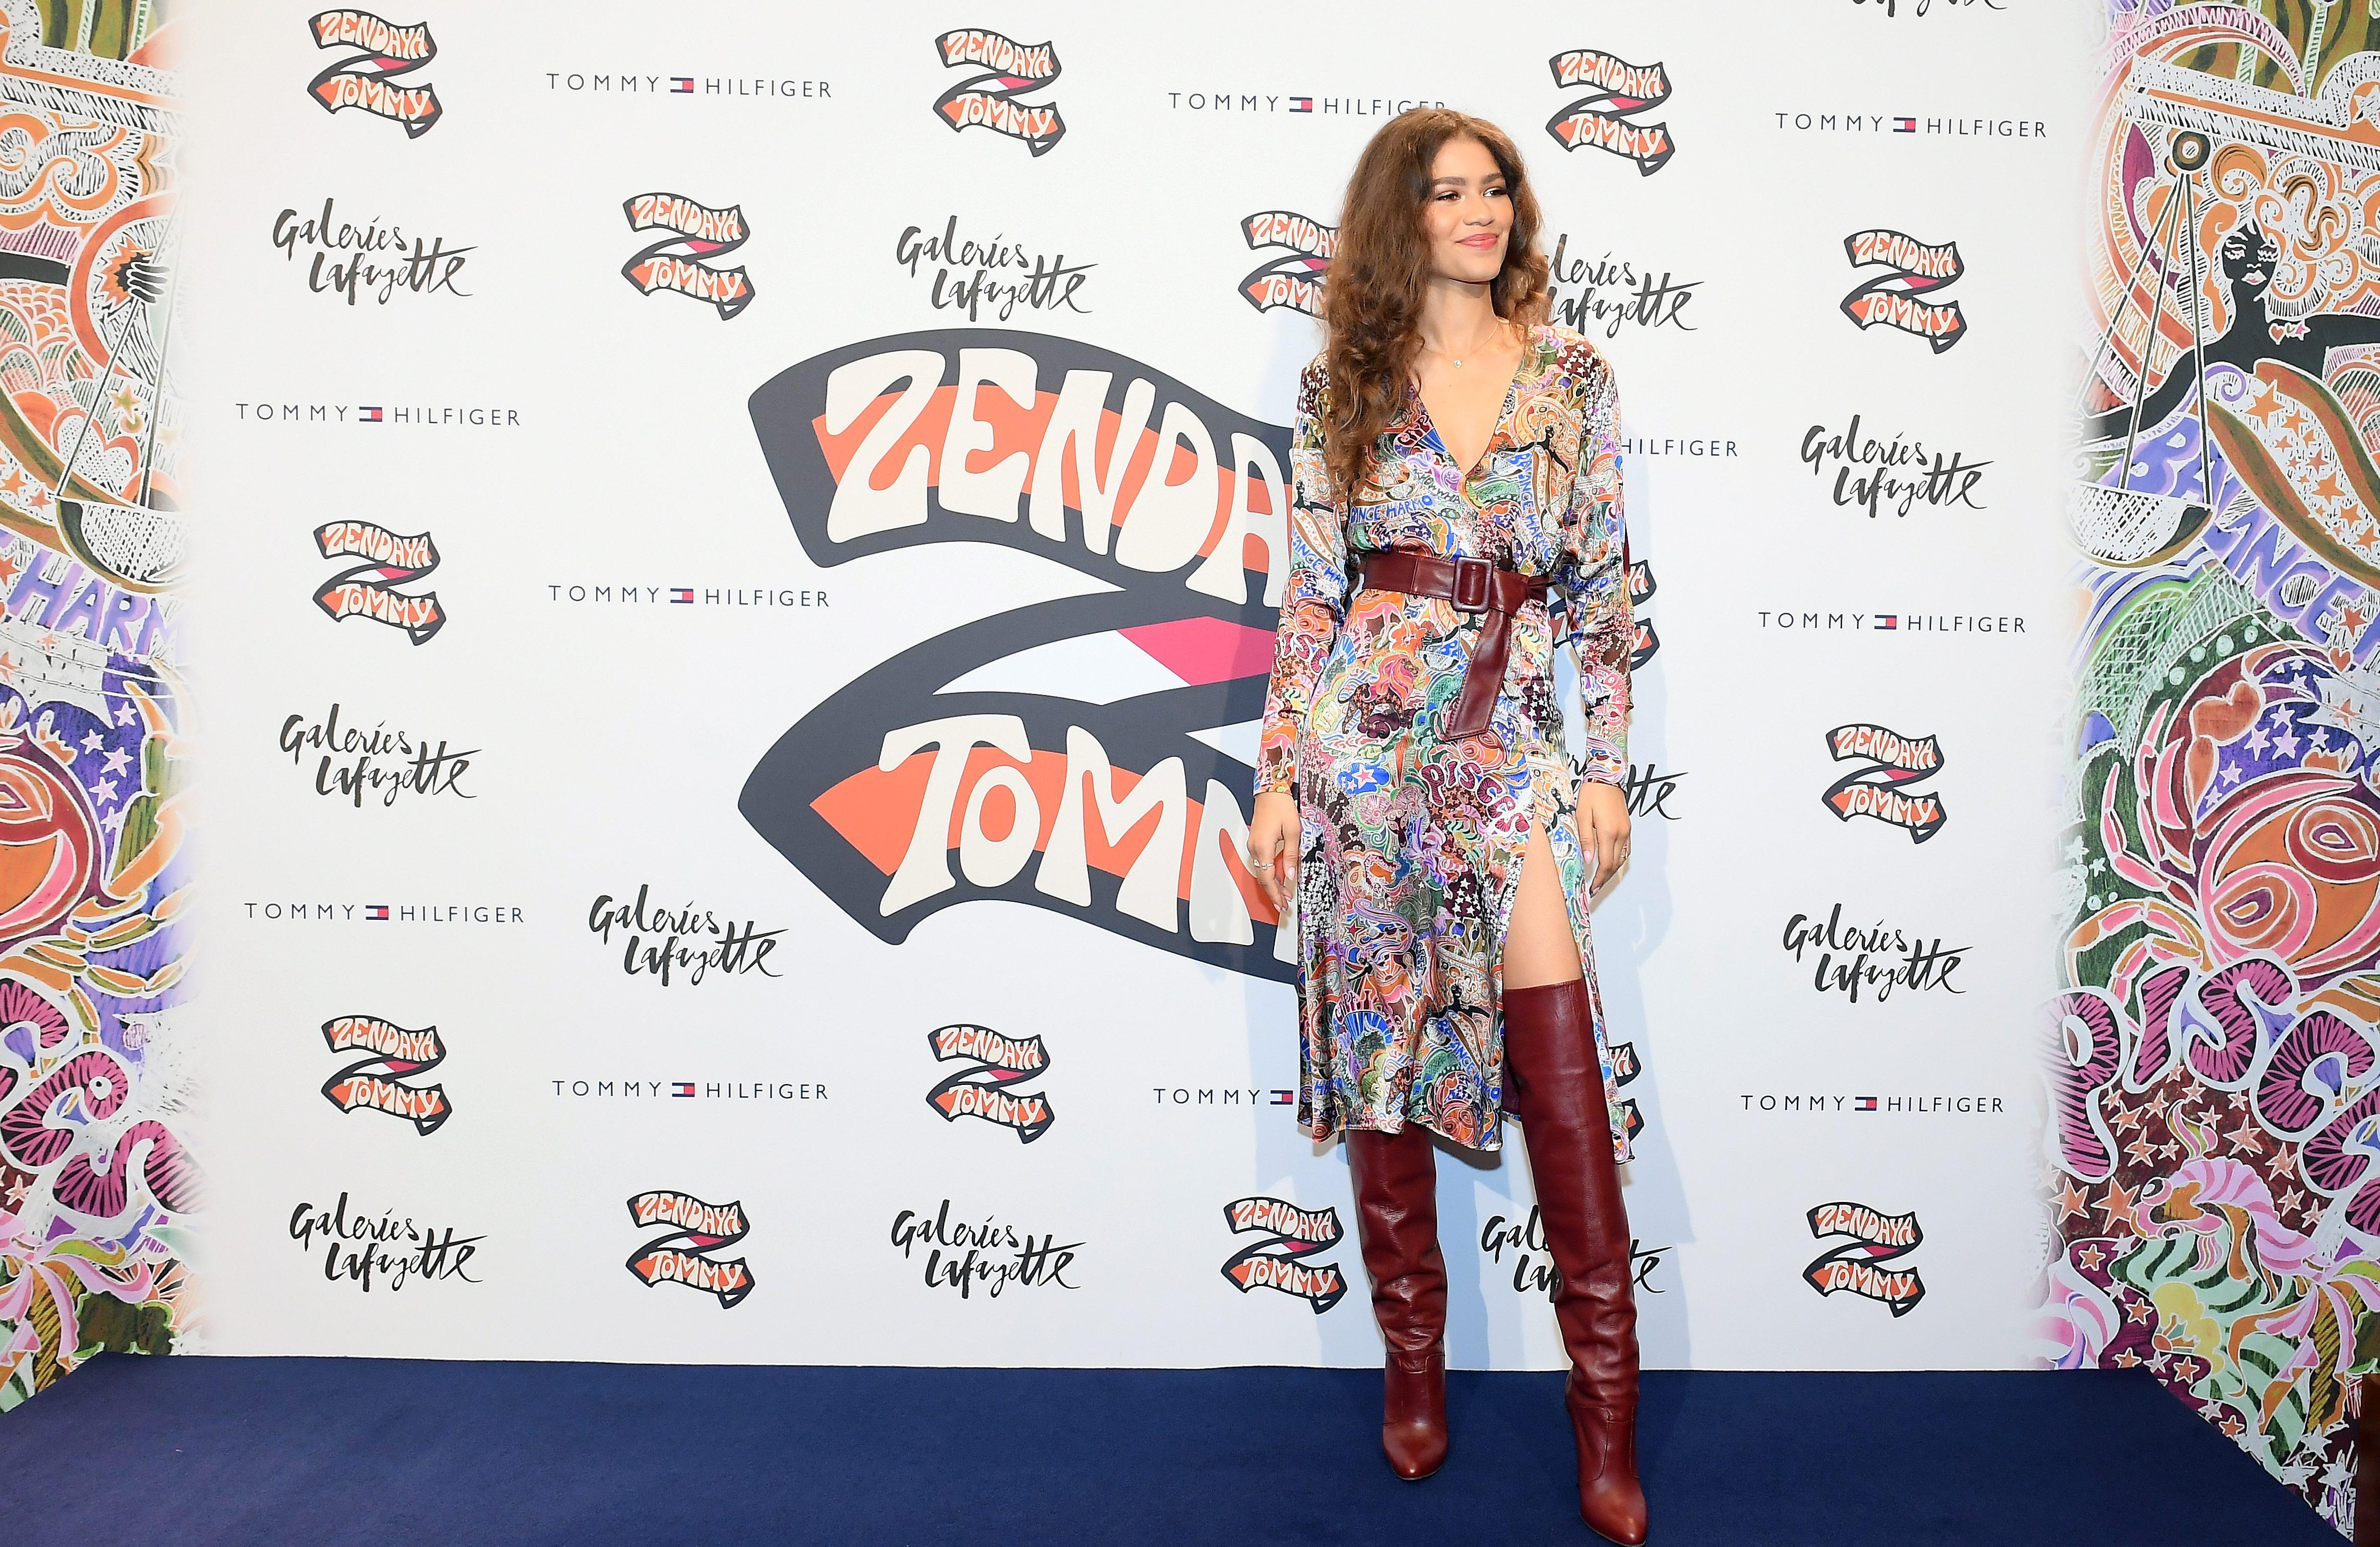 Zendaya S Tommy Hilfiger Line Has All Black Model Fashion Show In Paris